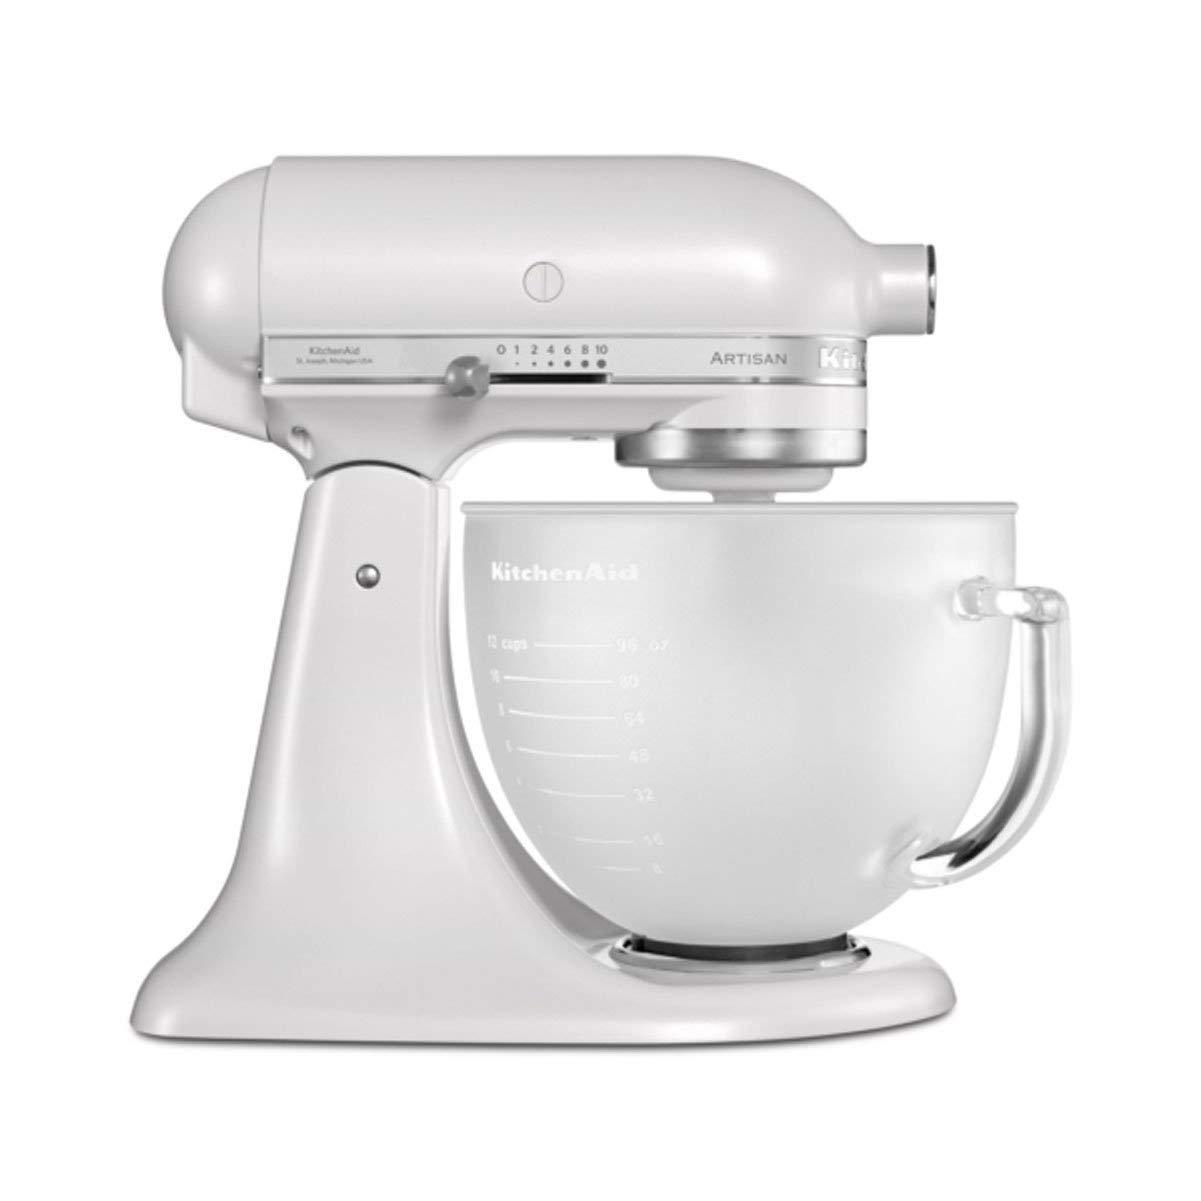 KitchenAid 5KSM156PS - Robot De Cocina Kitchen Aid 5Ksm156 Efp Con Bol De Cristal Translúcido: Amazon.es: Hogar